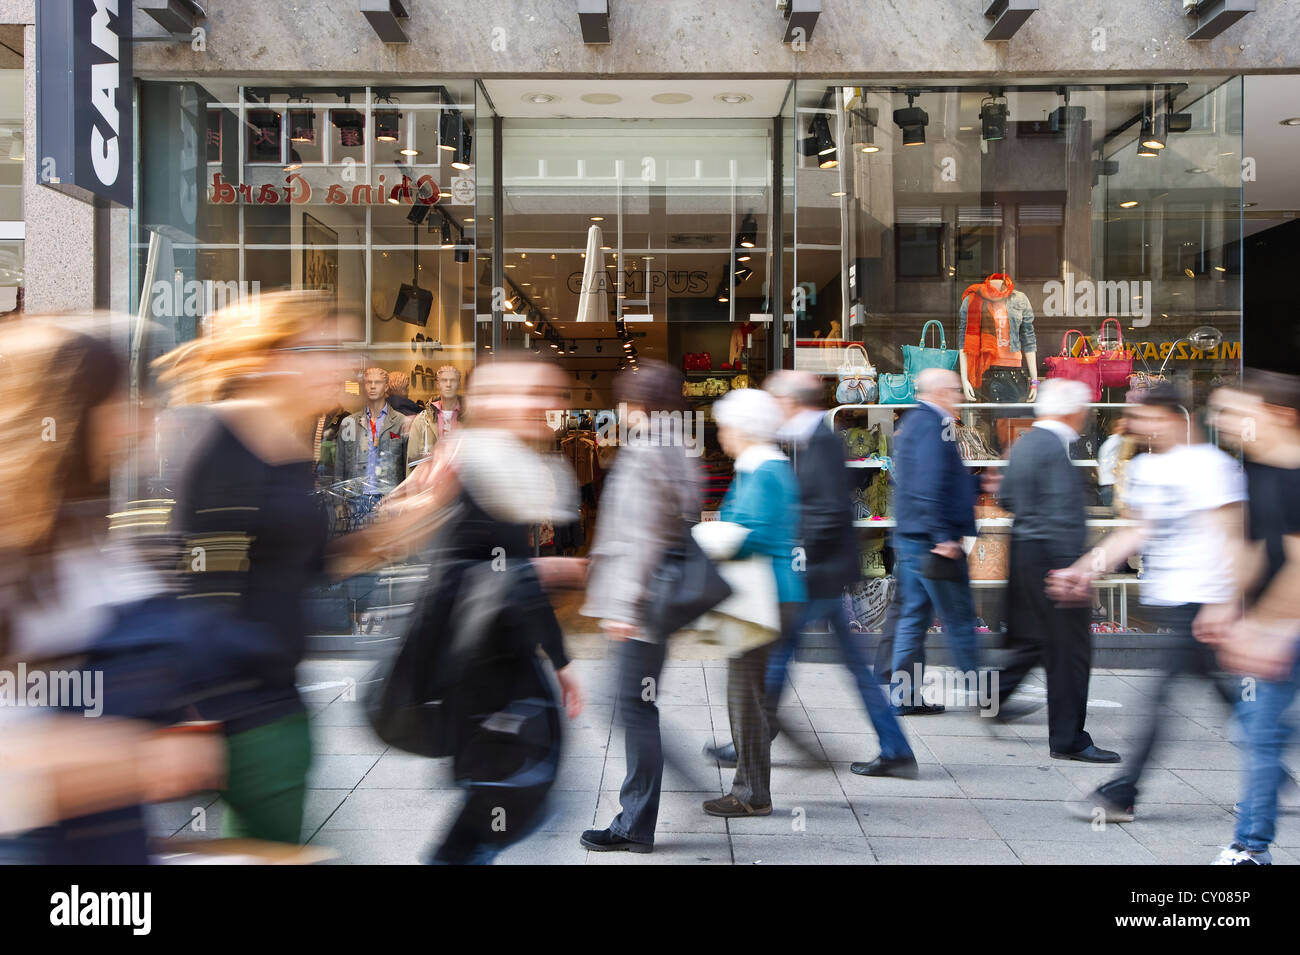 Pedestrian zone with people walking pass, motion blur, Stuttgart, Baden-Wuerttemberg - Stock Image